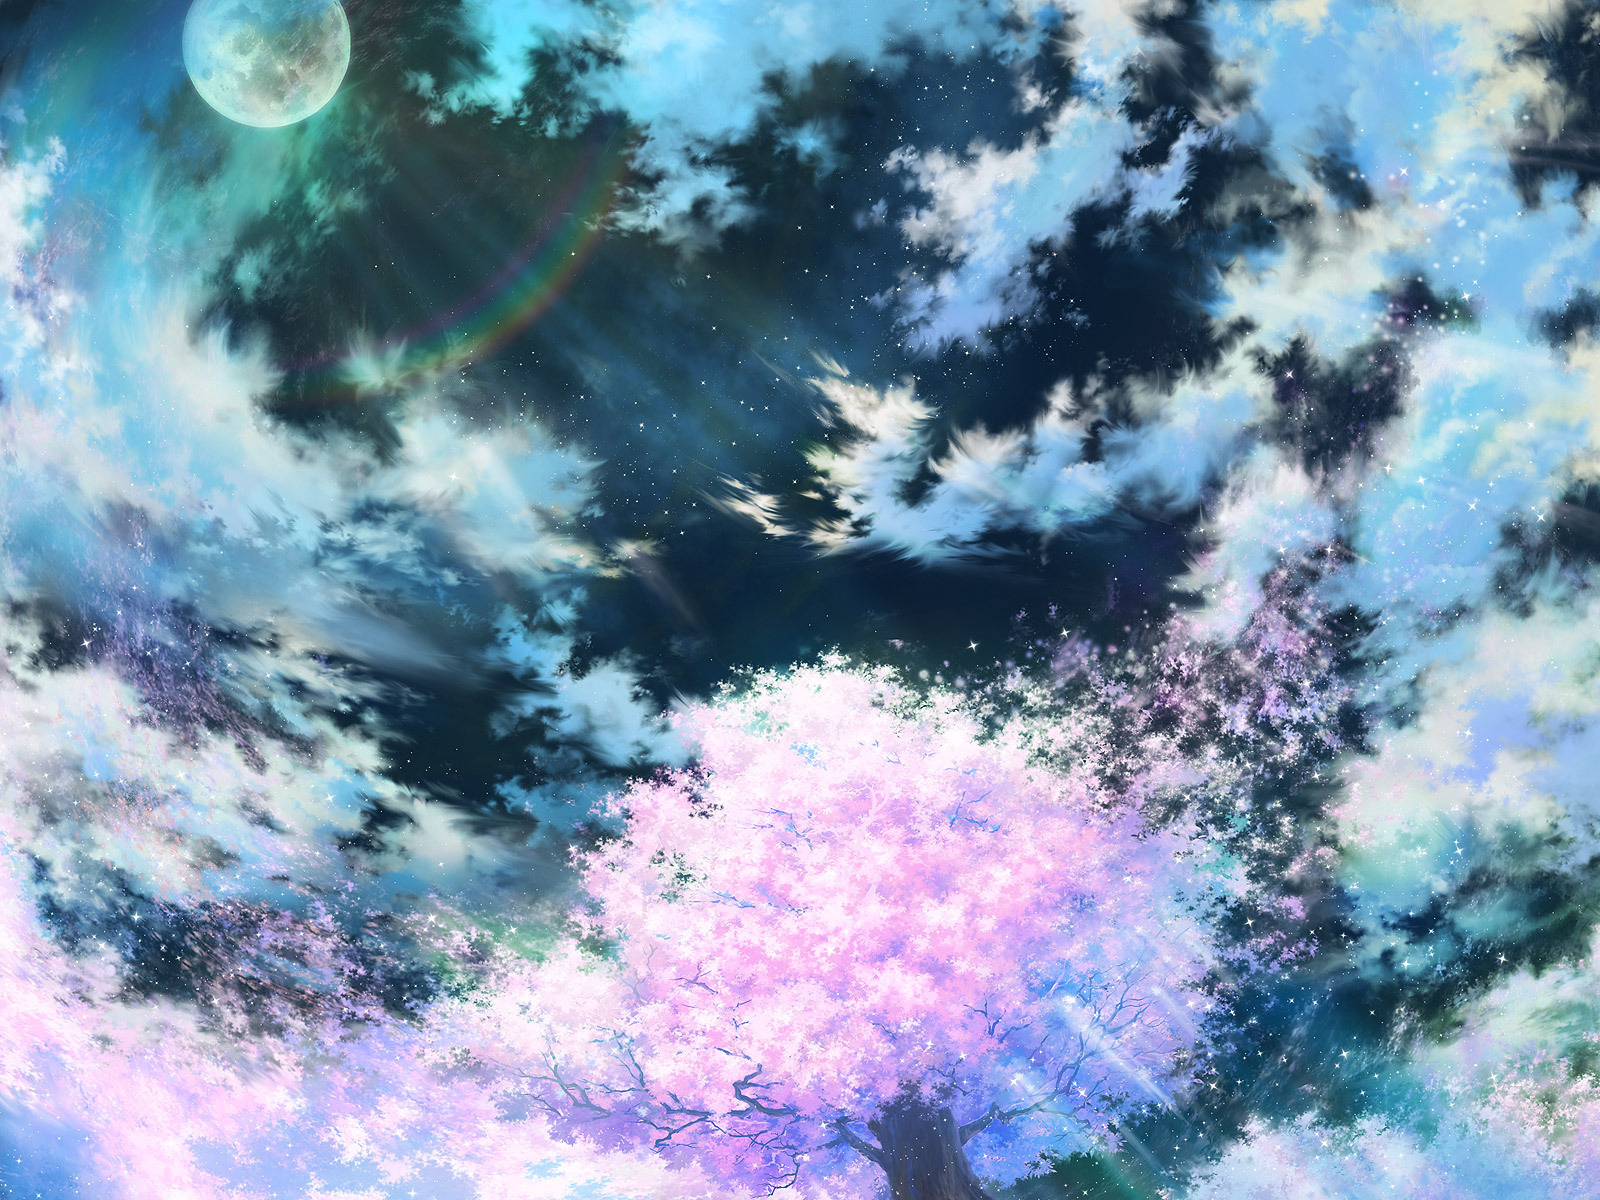 beautiful anime scenery - Google Search   Anime Scenes   Pinterest